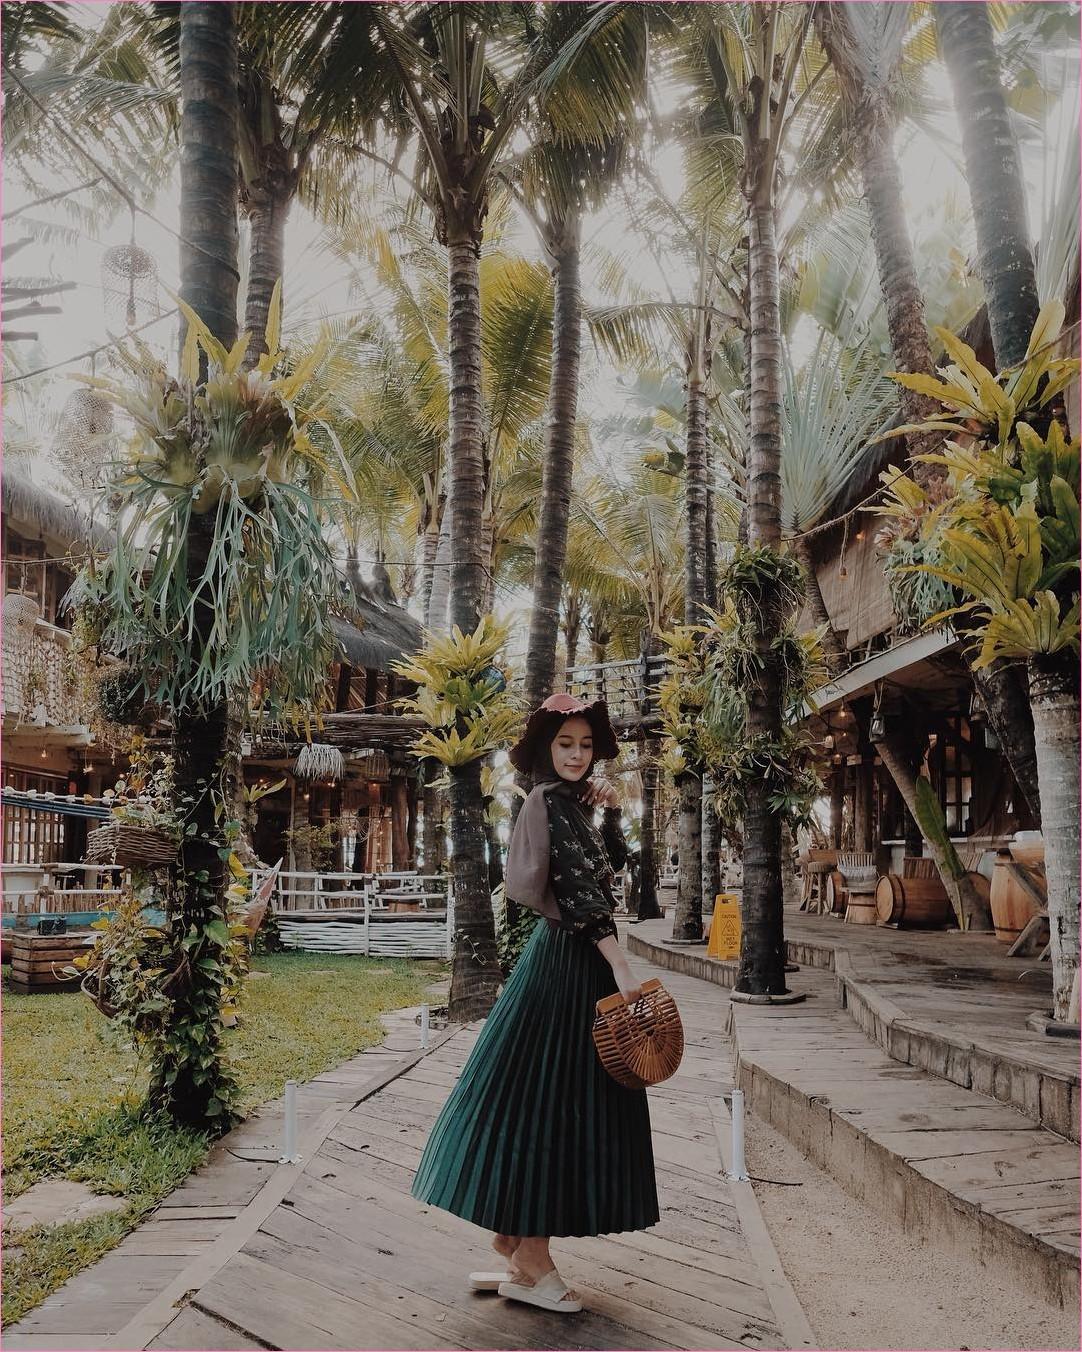 Outfit Rok Untuk Hijabers Ala Selebgram 2018 loafers and slip ons sandals krem muda hijab pashmina diamond krem muda top blouse kemeja hitam topi coboy handbags bambu rotan coklat broomstick skirt hijau tua ootd trendy